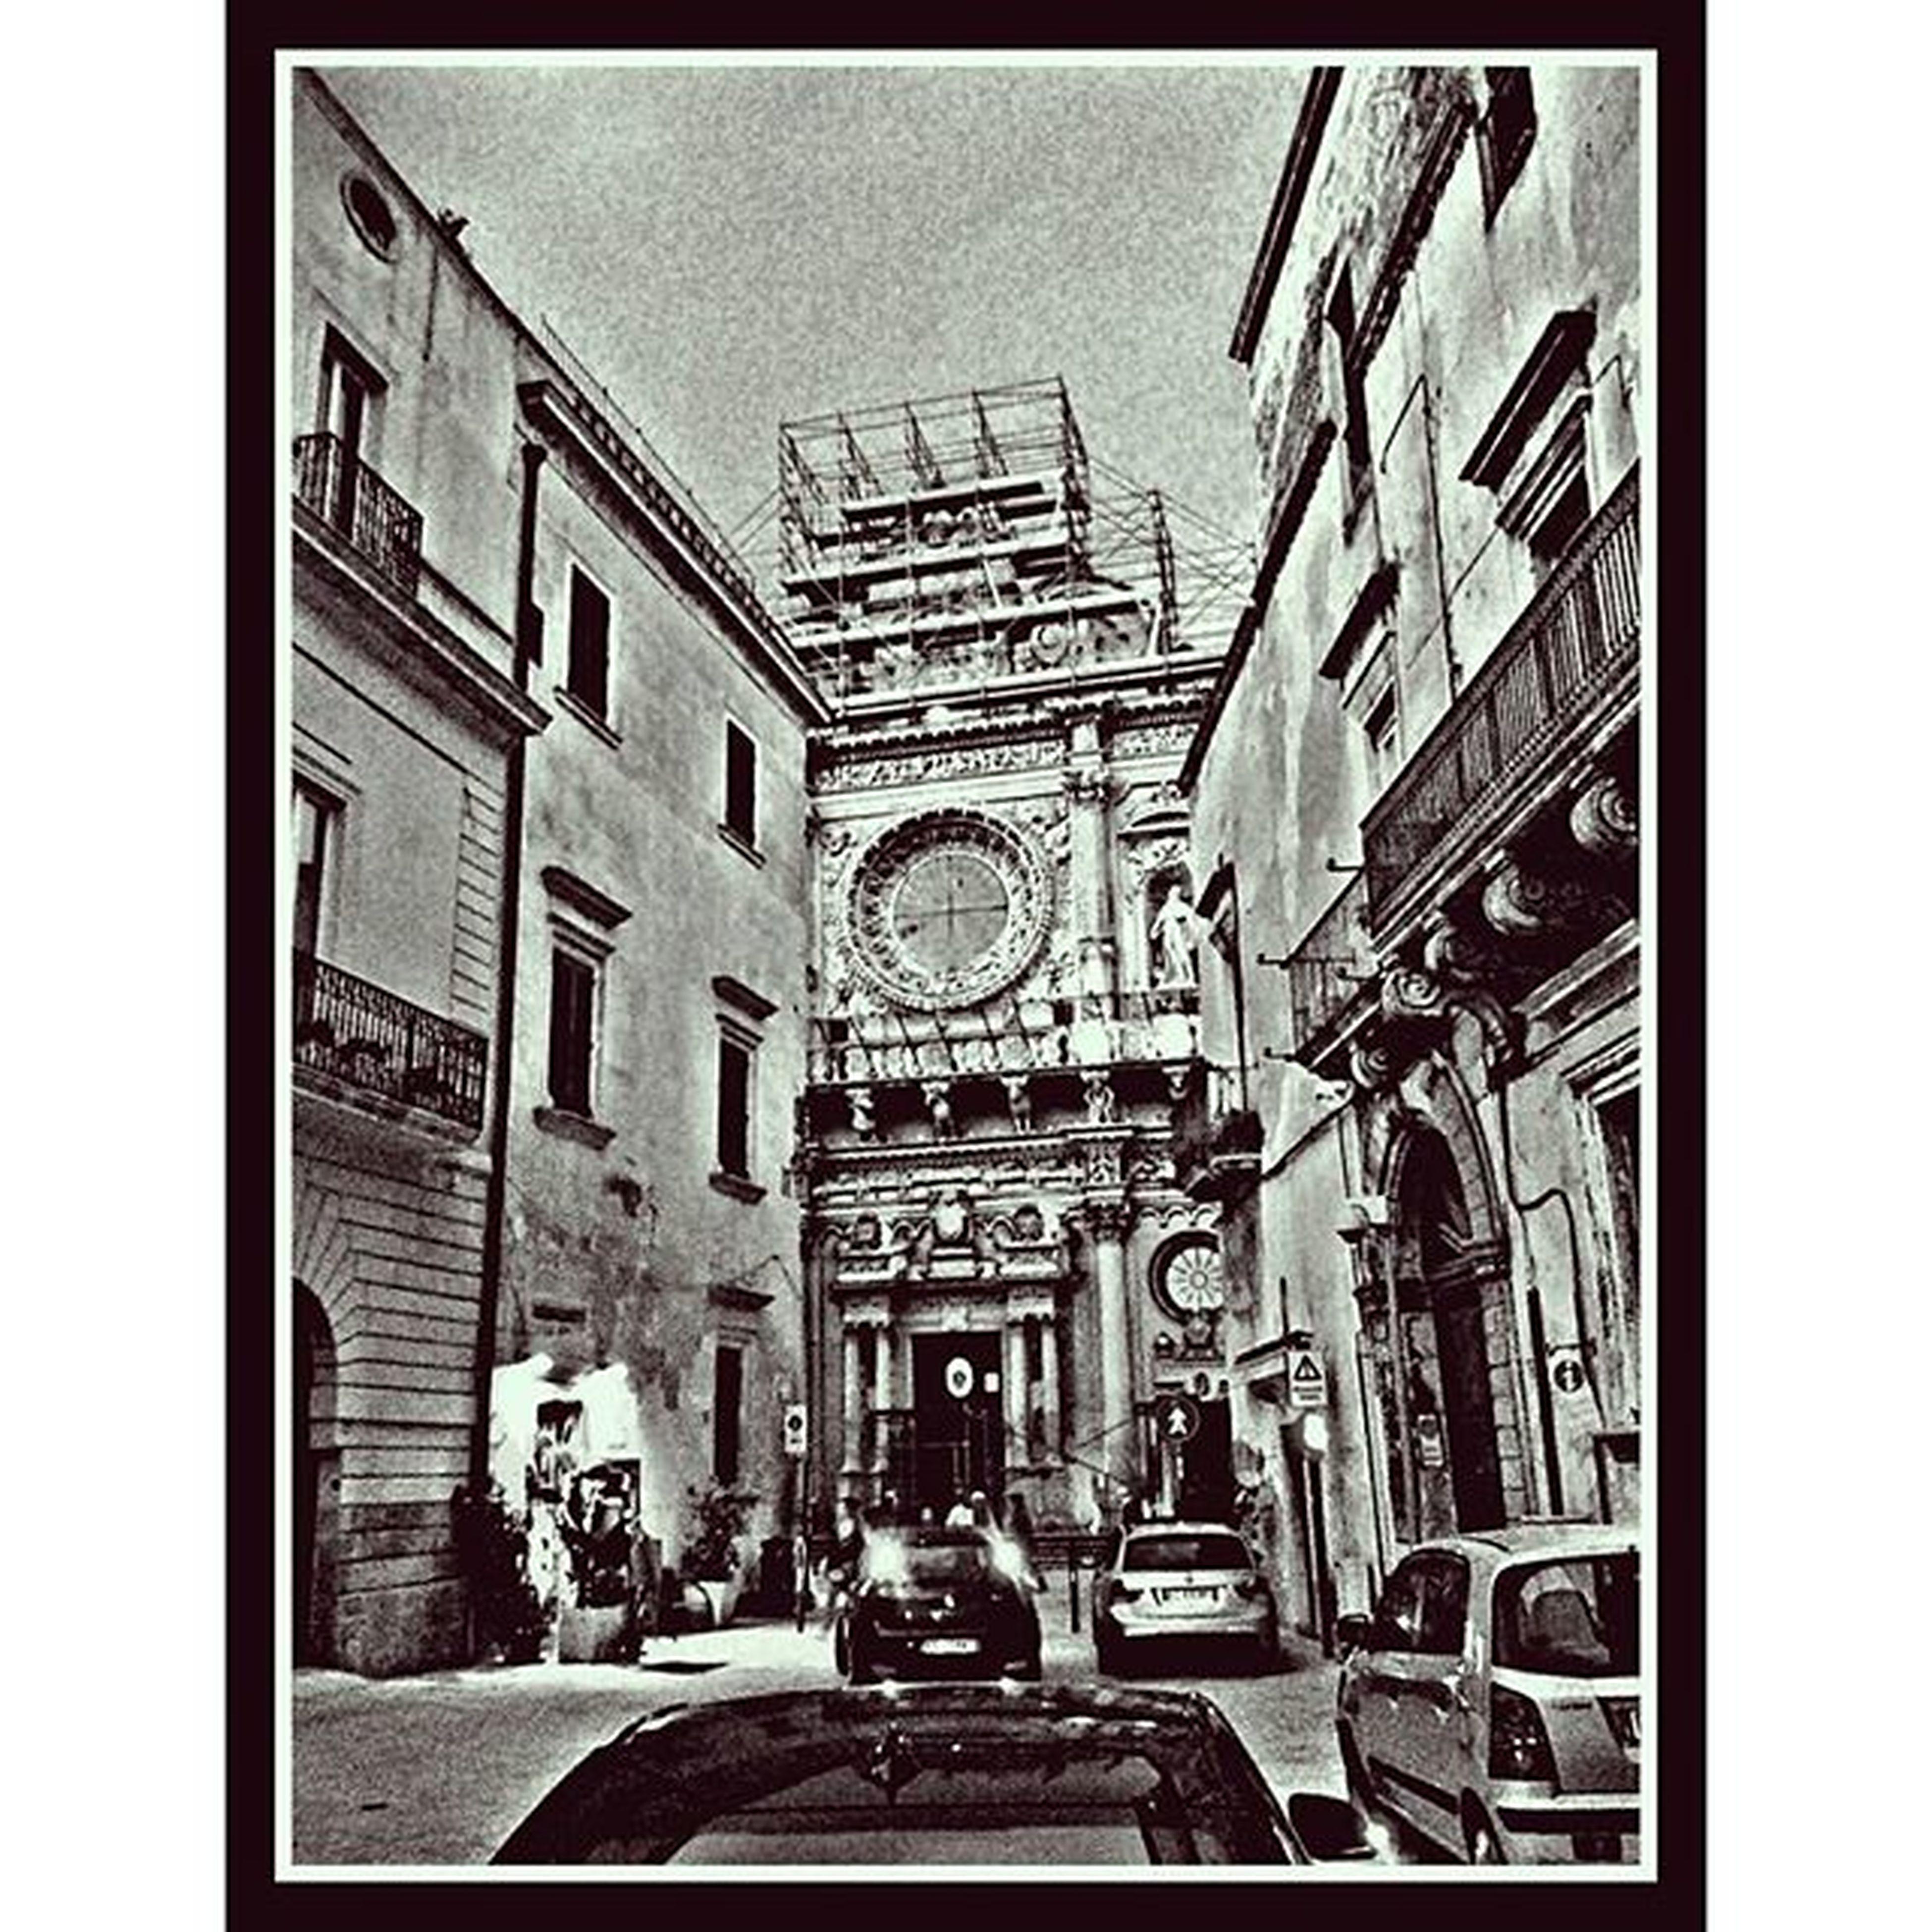 Lecce Salento Samtacroce Biancoenero Picofday Instaitalia Igersitalia Italy SouthofItaly B &wL4l Prospettiva Barocco